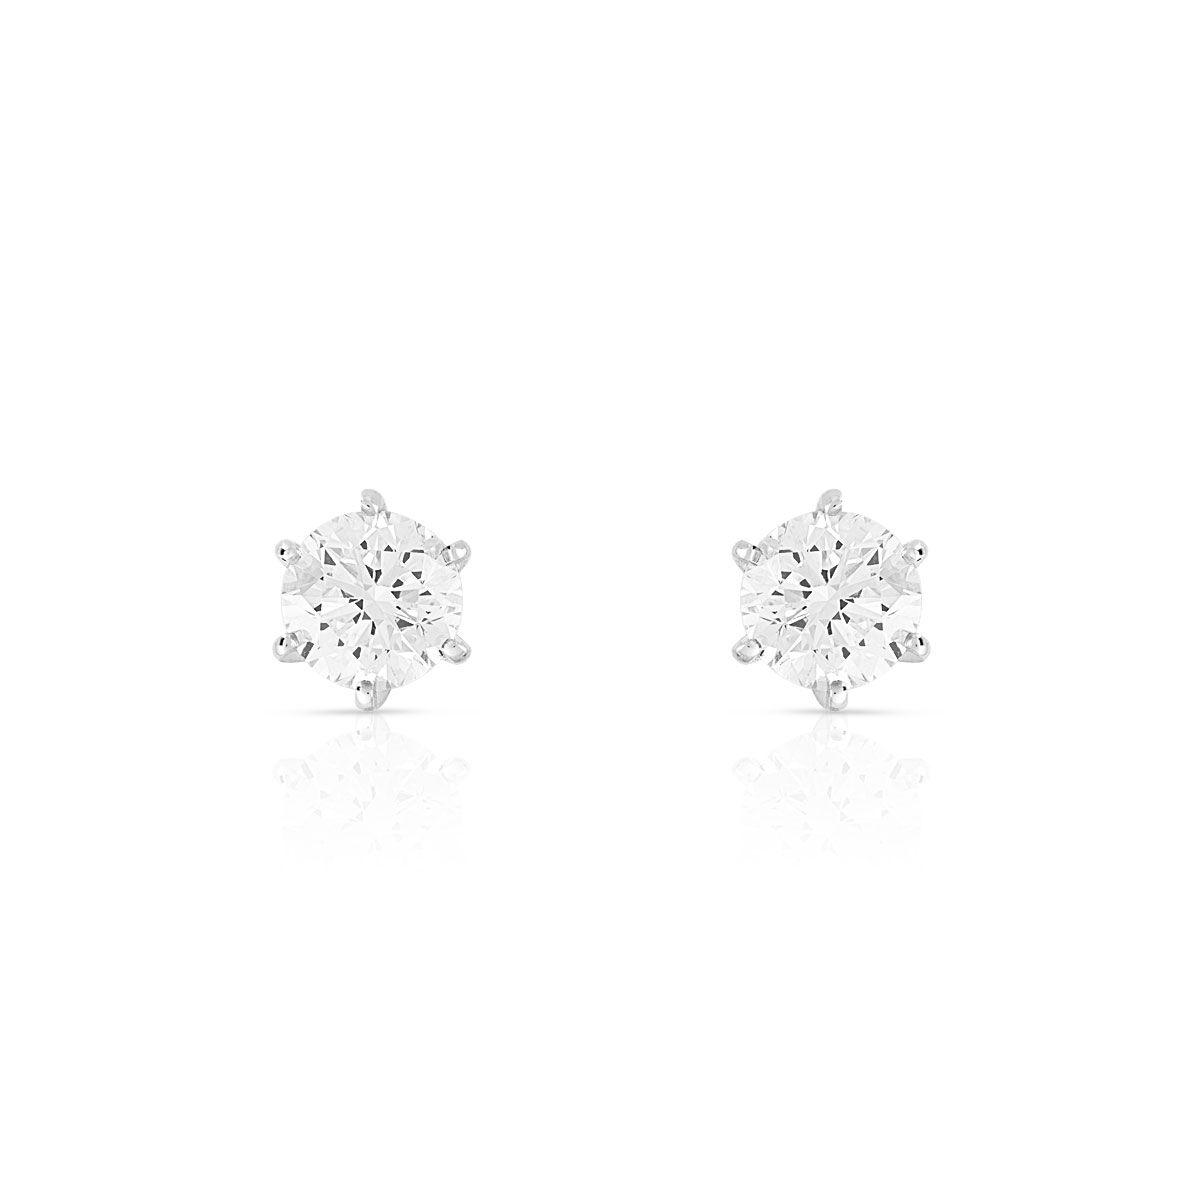 MATY Boucles d'oreilles or 750 blanc diamants synthétiques 0.80 carat- MATY